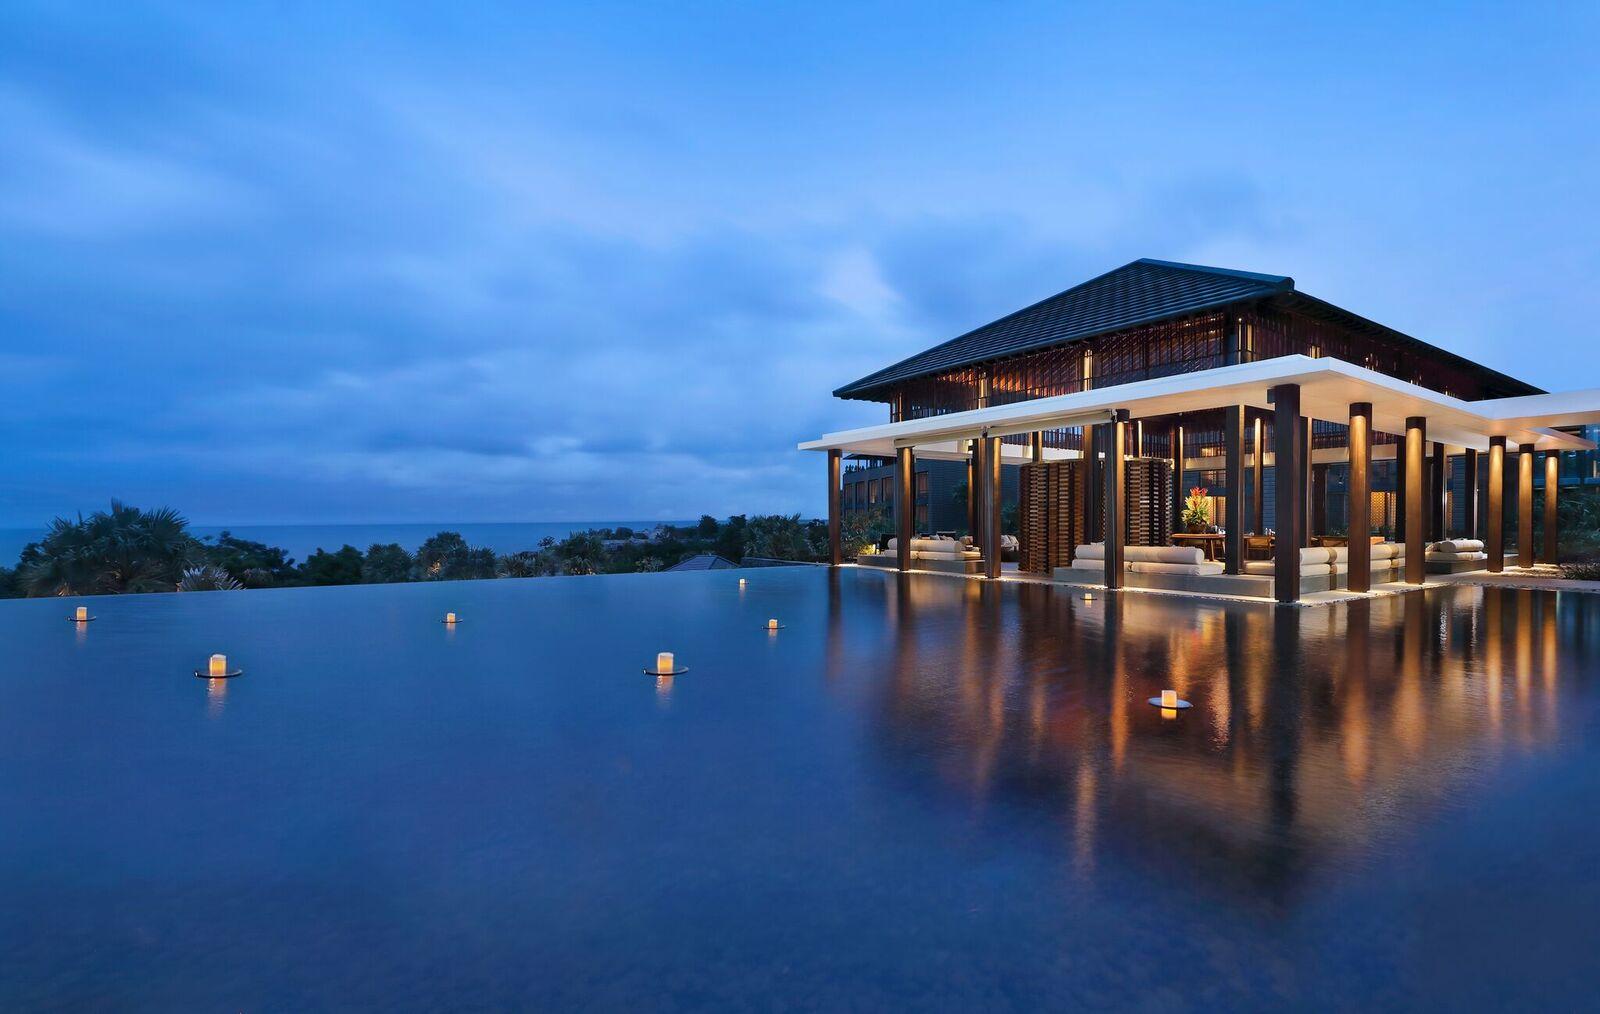 "Radisson Blu Bali Uluwatu: The New Pinnacle of Bali, The ""Cowabunga"" of Hotels"